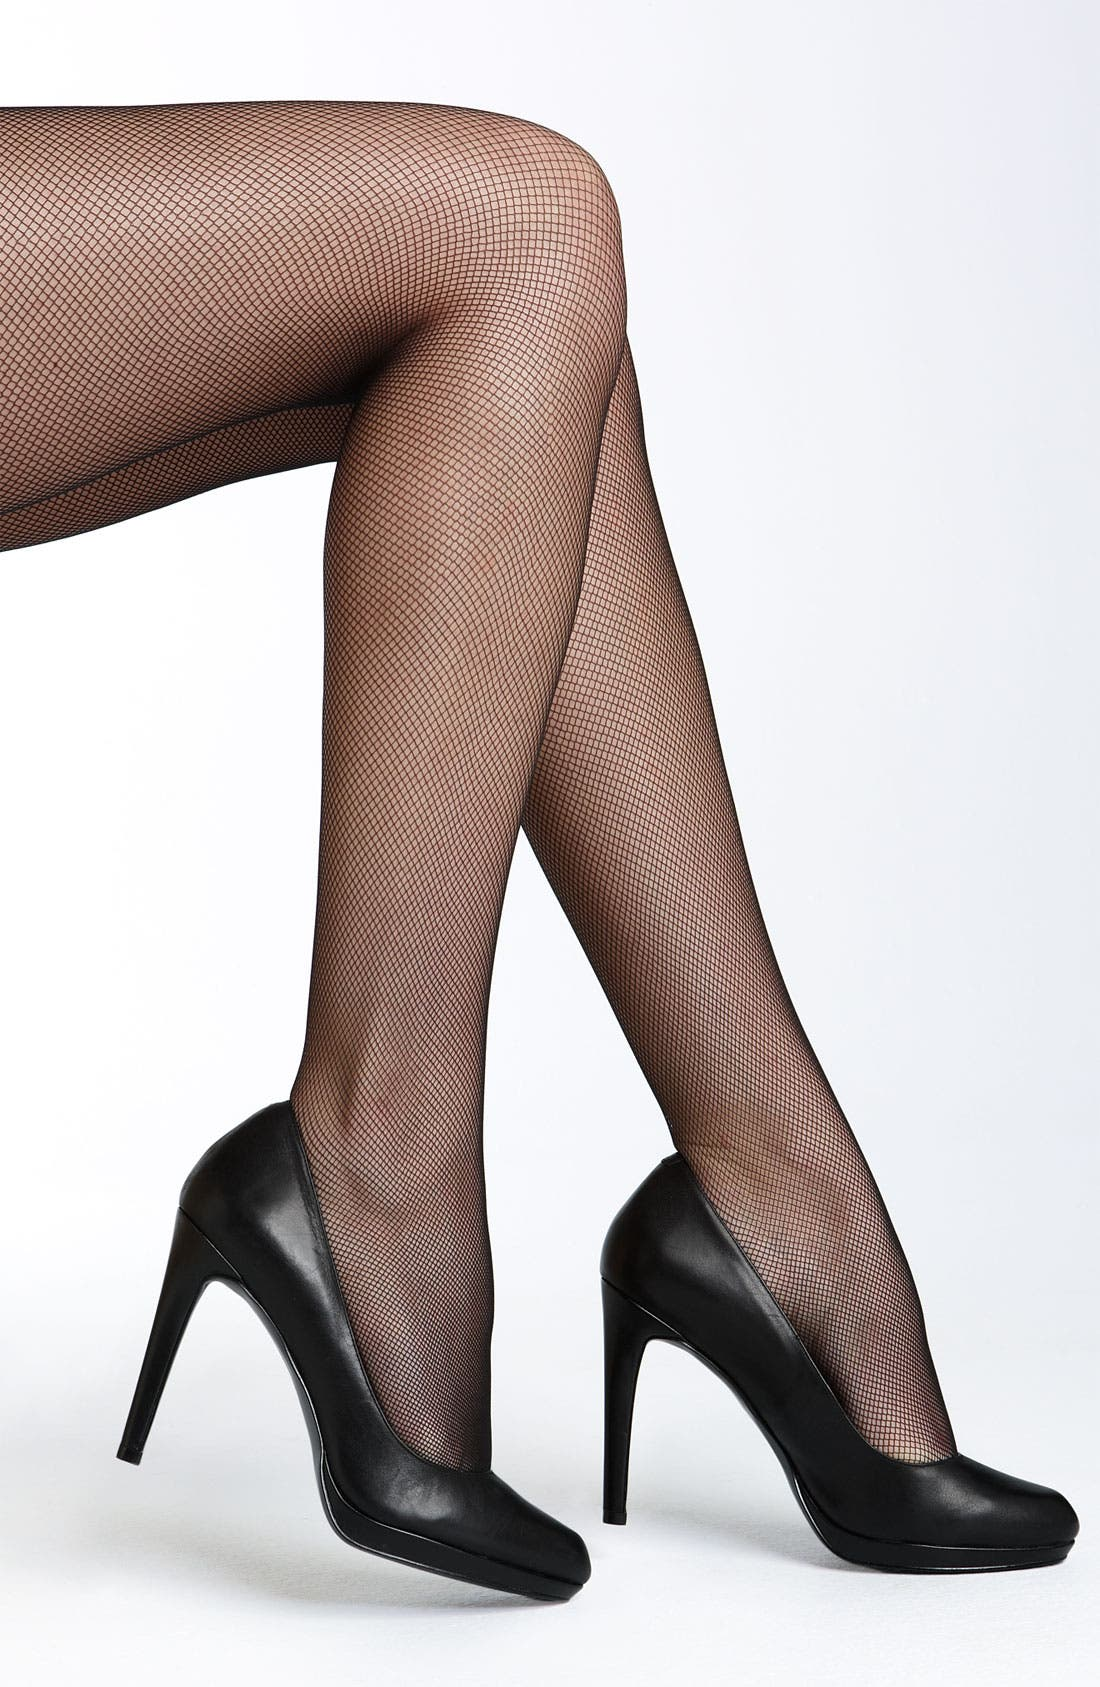 Main Image - Donna Karan 'Micro Tulle' Tights